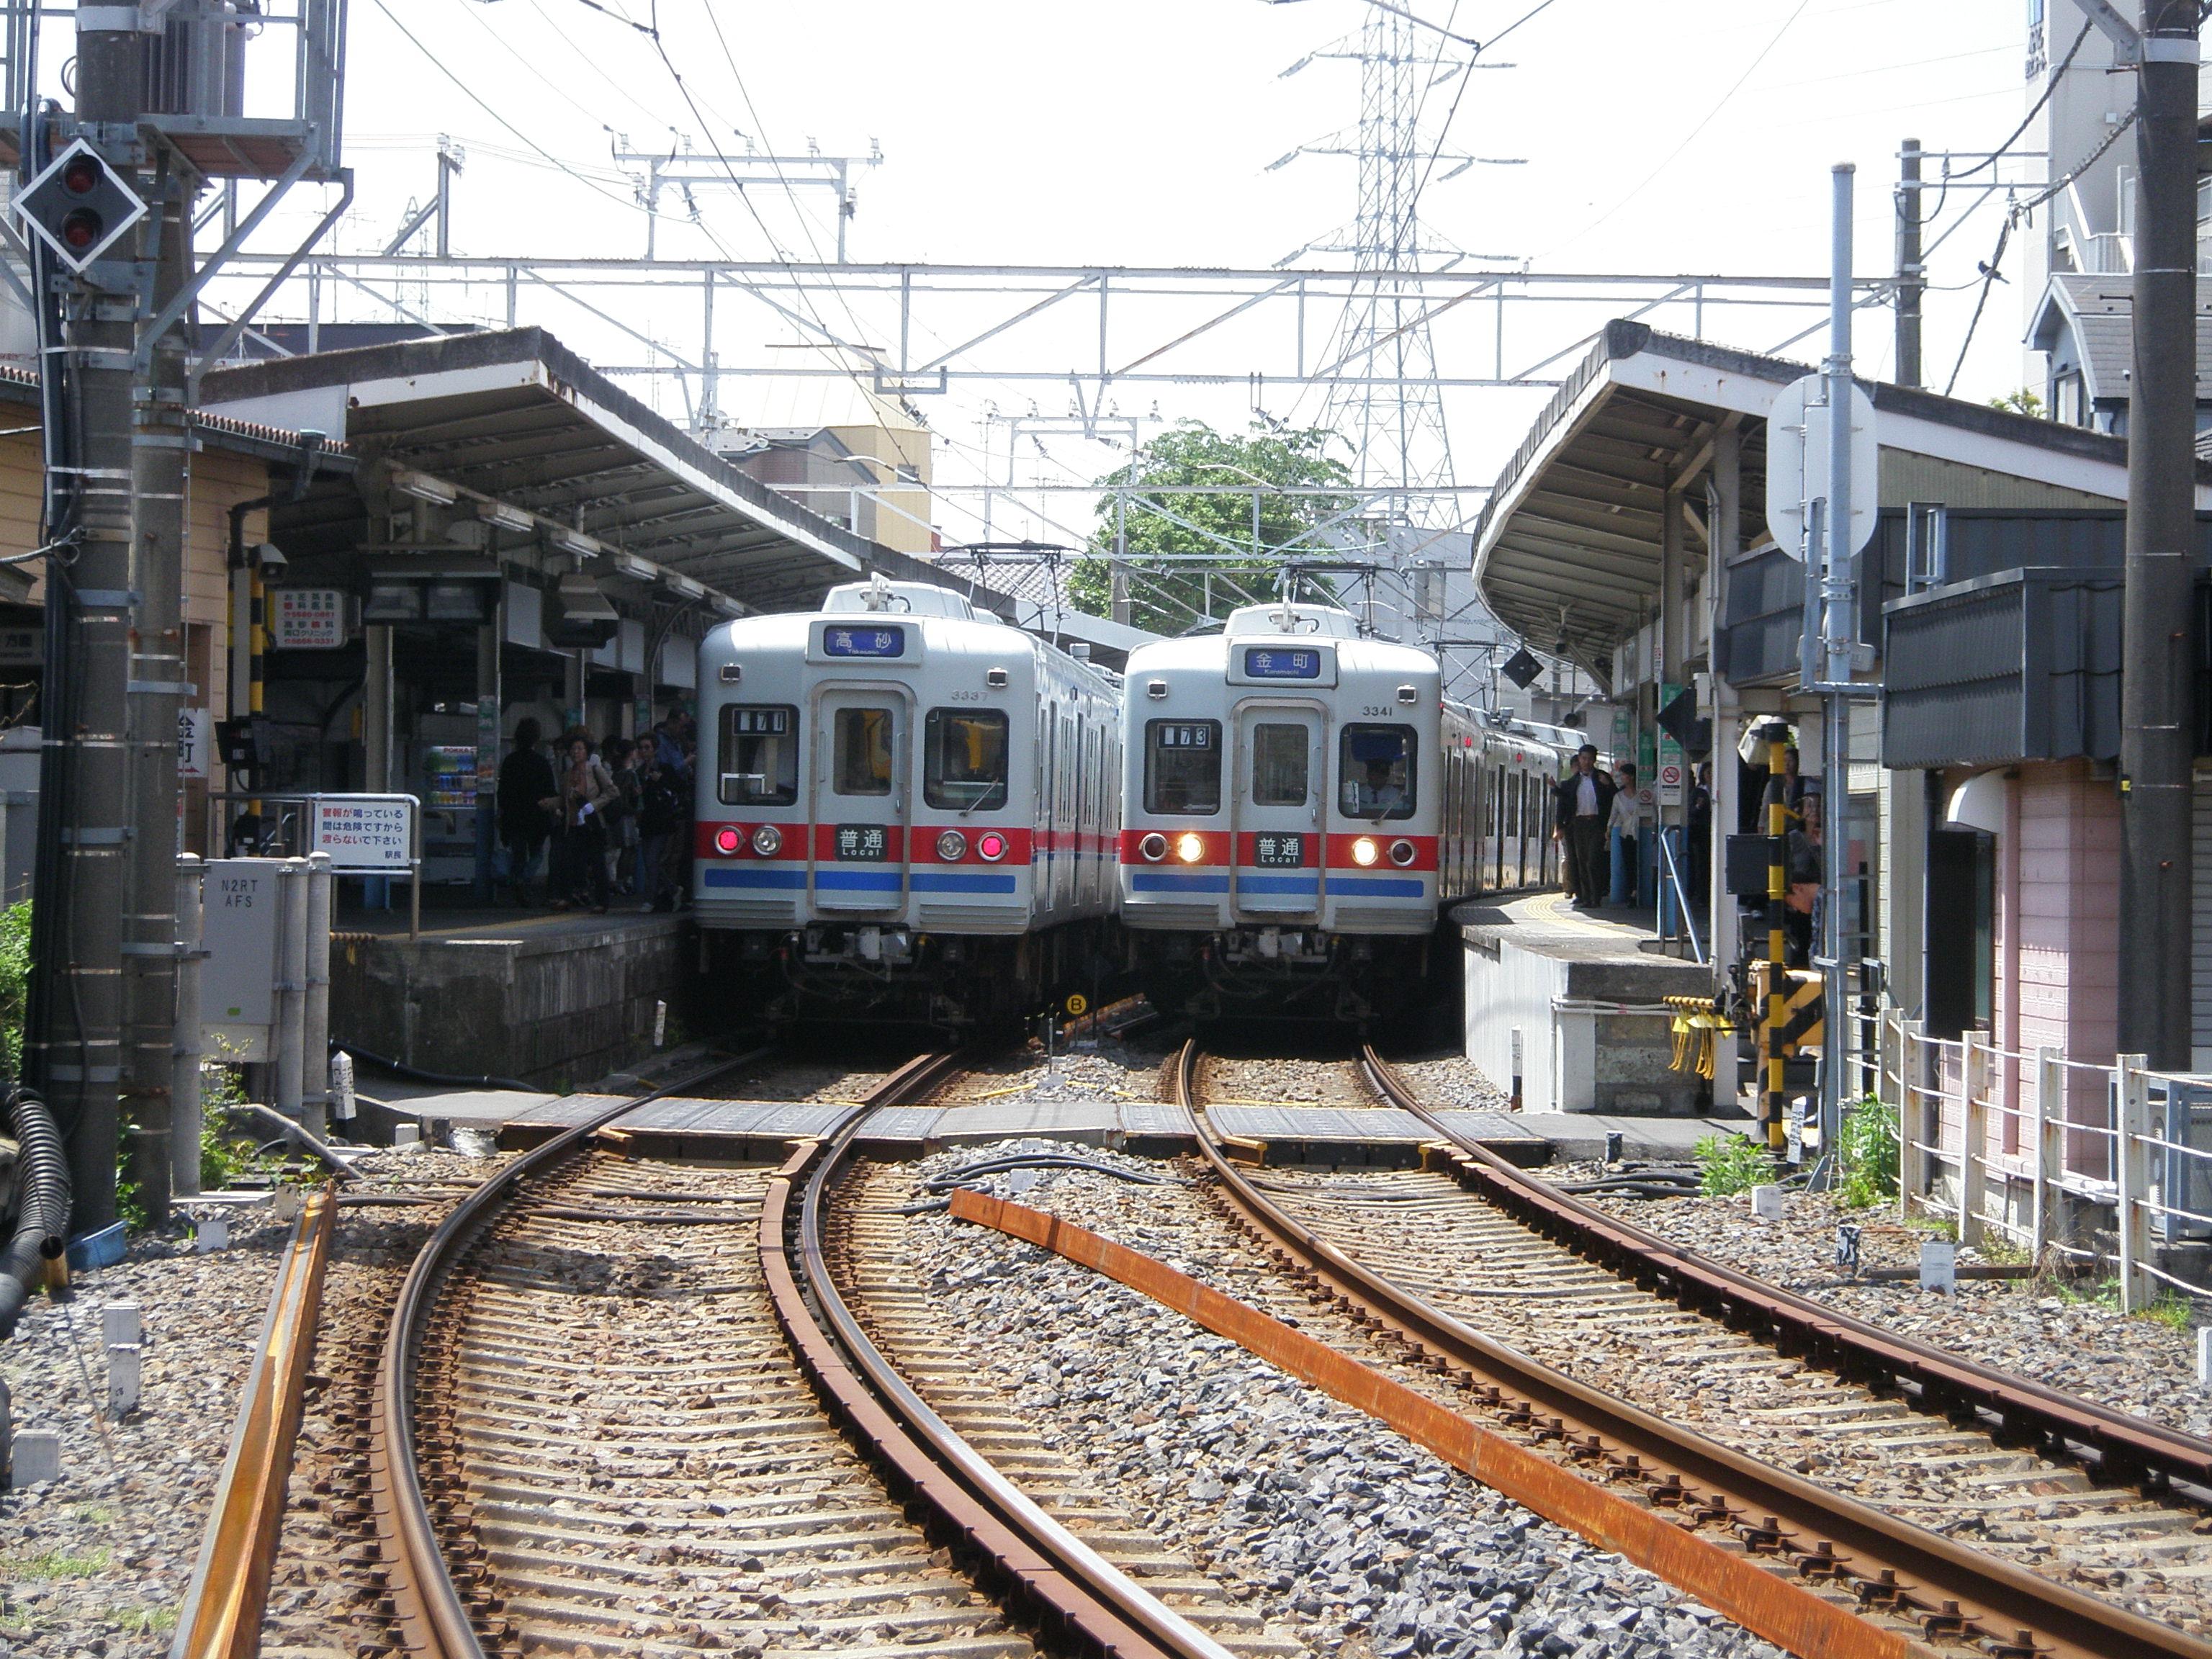 https://upload.wikimedia.org/wikipedia/commons/7/79/Shibamata_Station%2C_platform.JPG